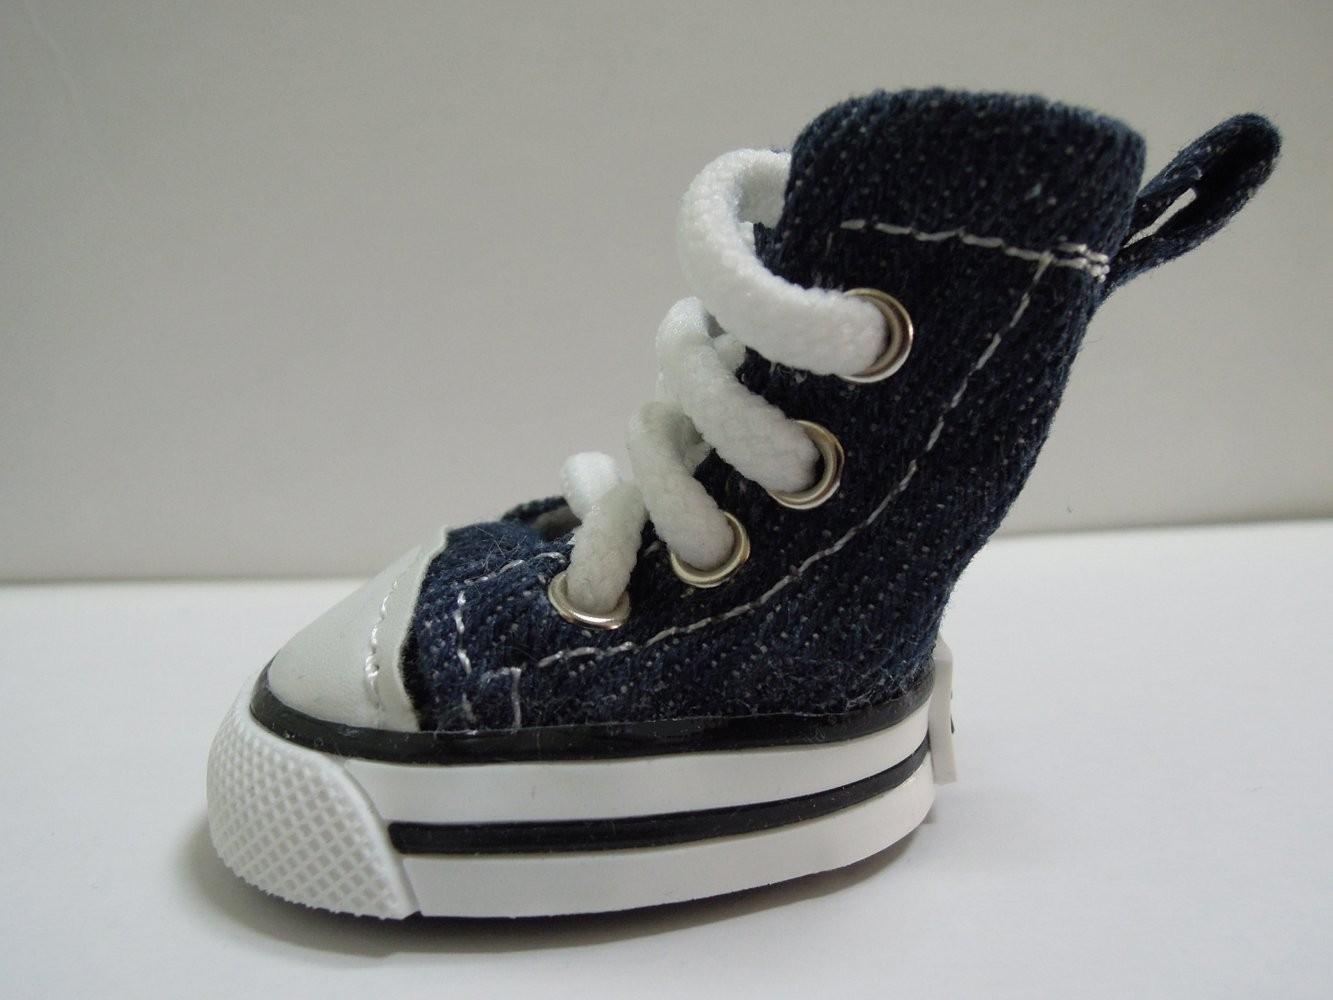 Petfavorites Cute Puppy Pet Dog Sporty Shoes Lace Up Bluepink